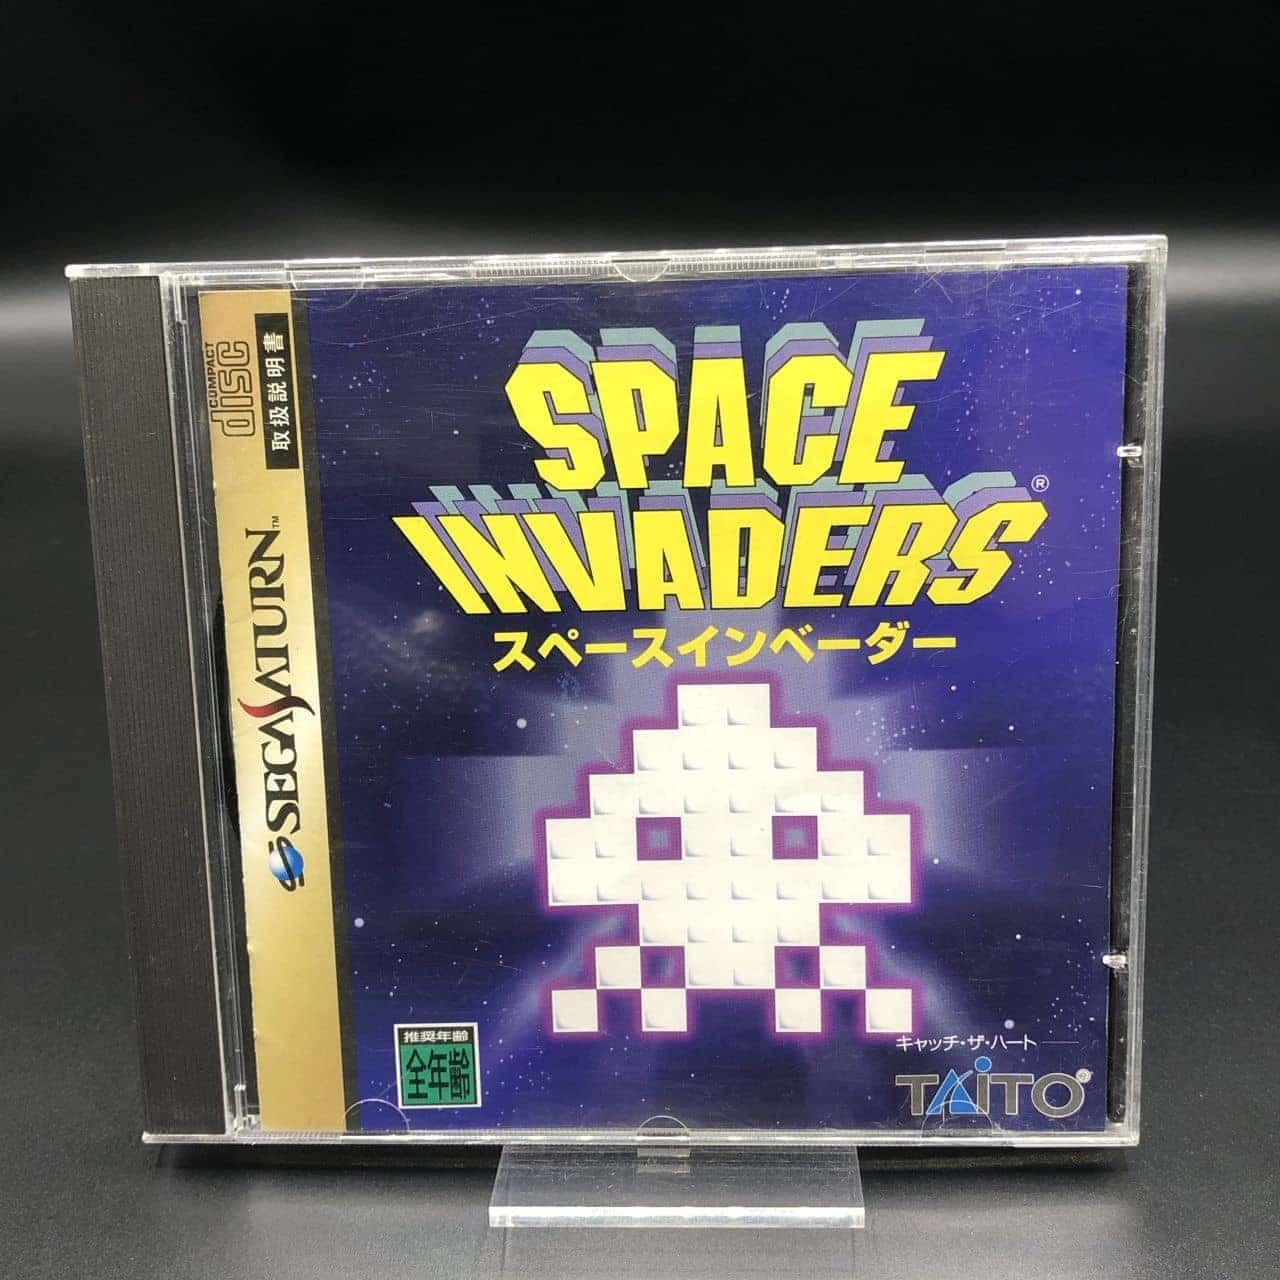 Space Invaders (Import Japan) (Komplett) (Sehr gut) Sega Saturn